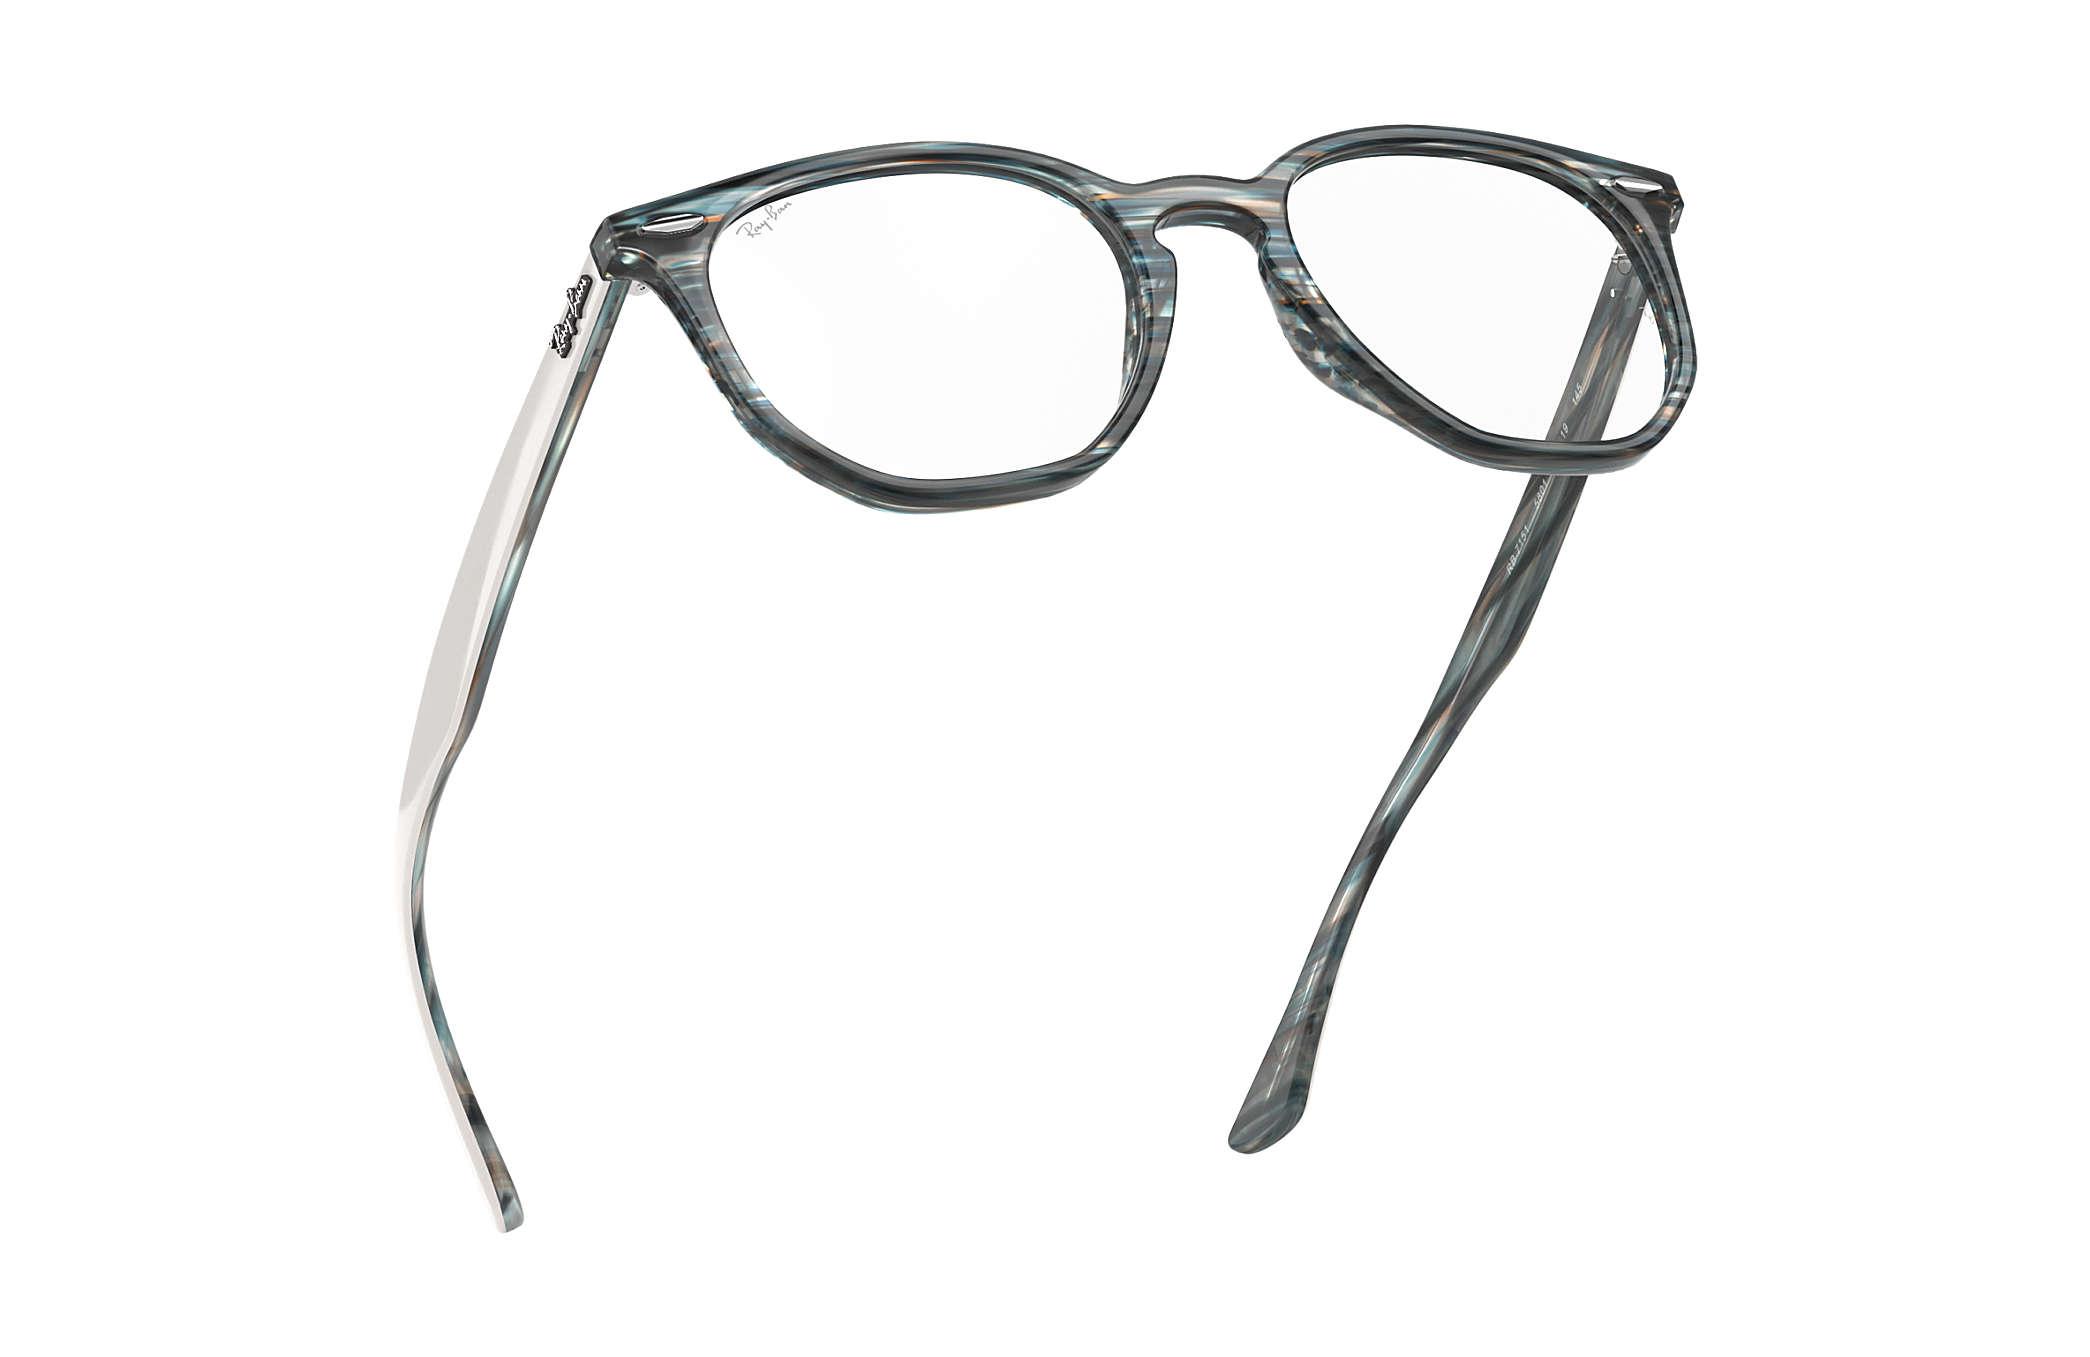 e48e1b3eb3 Ray-Ban eyeglasses Hexagonal Optics RB7151 Blue - Acetate ...